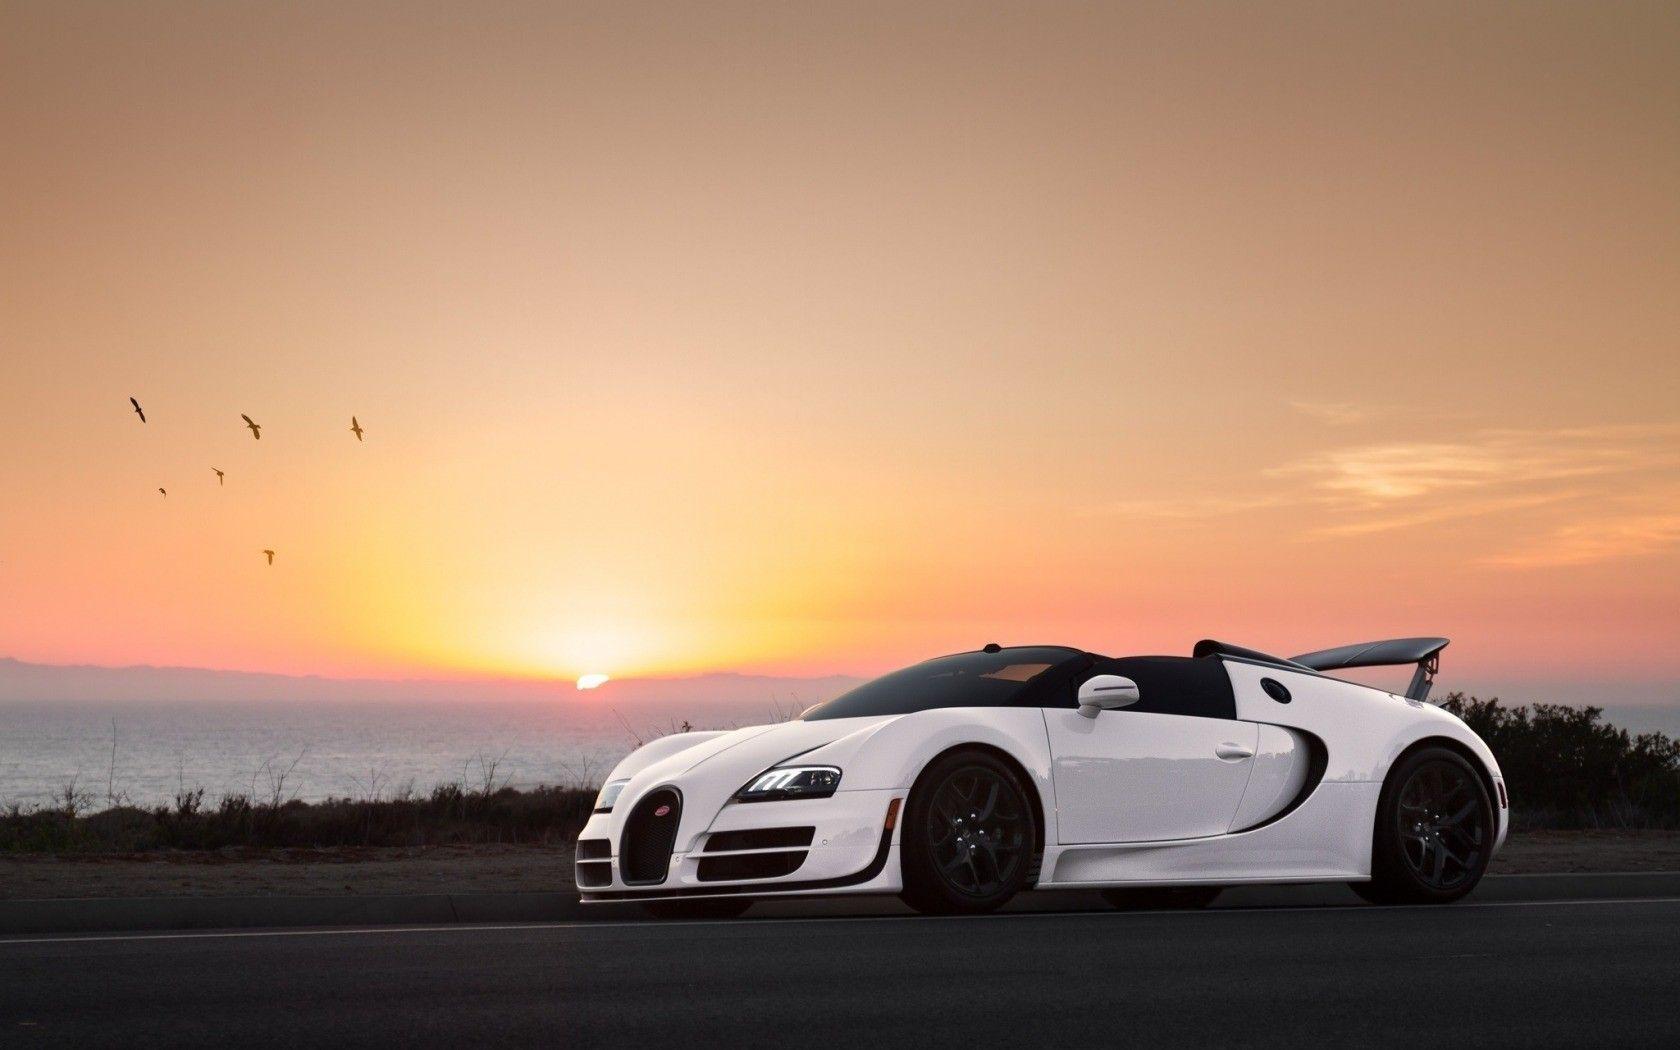 Bugatti Veyron Super Sport Wallpaper No 170124 Bugatti Veyron Super Sport Veyron Bugatti Veyron